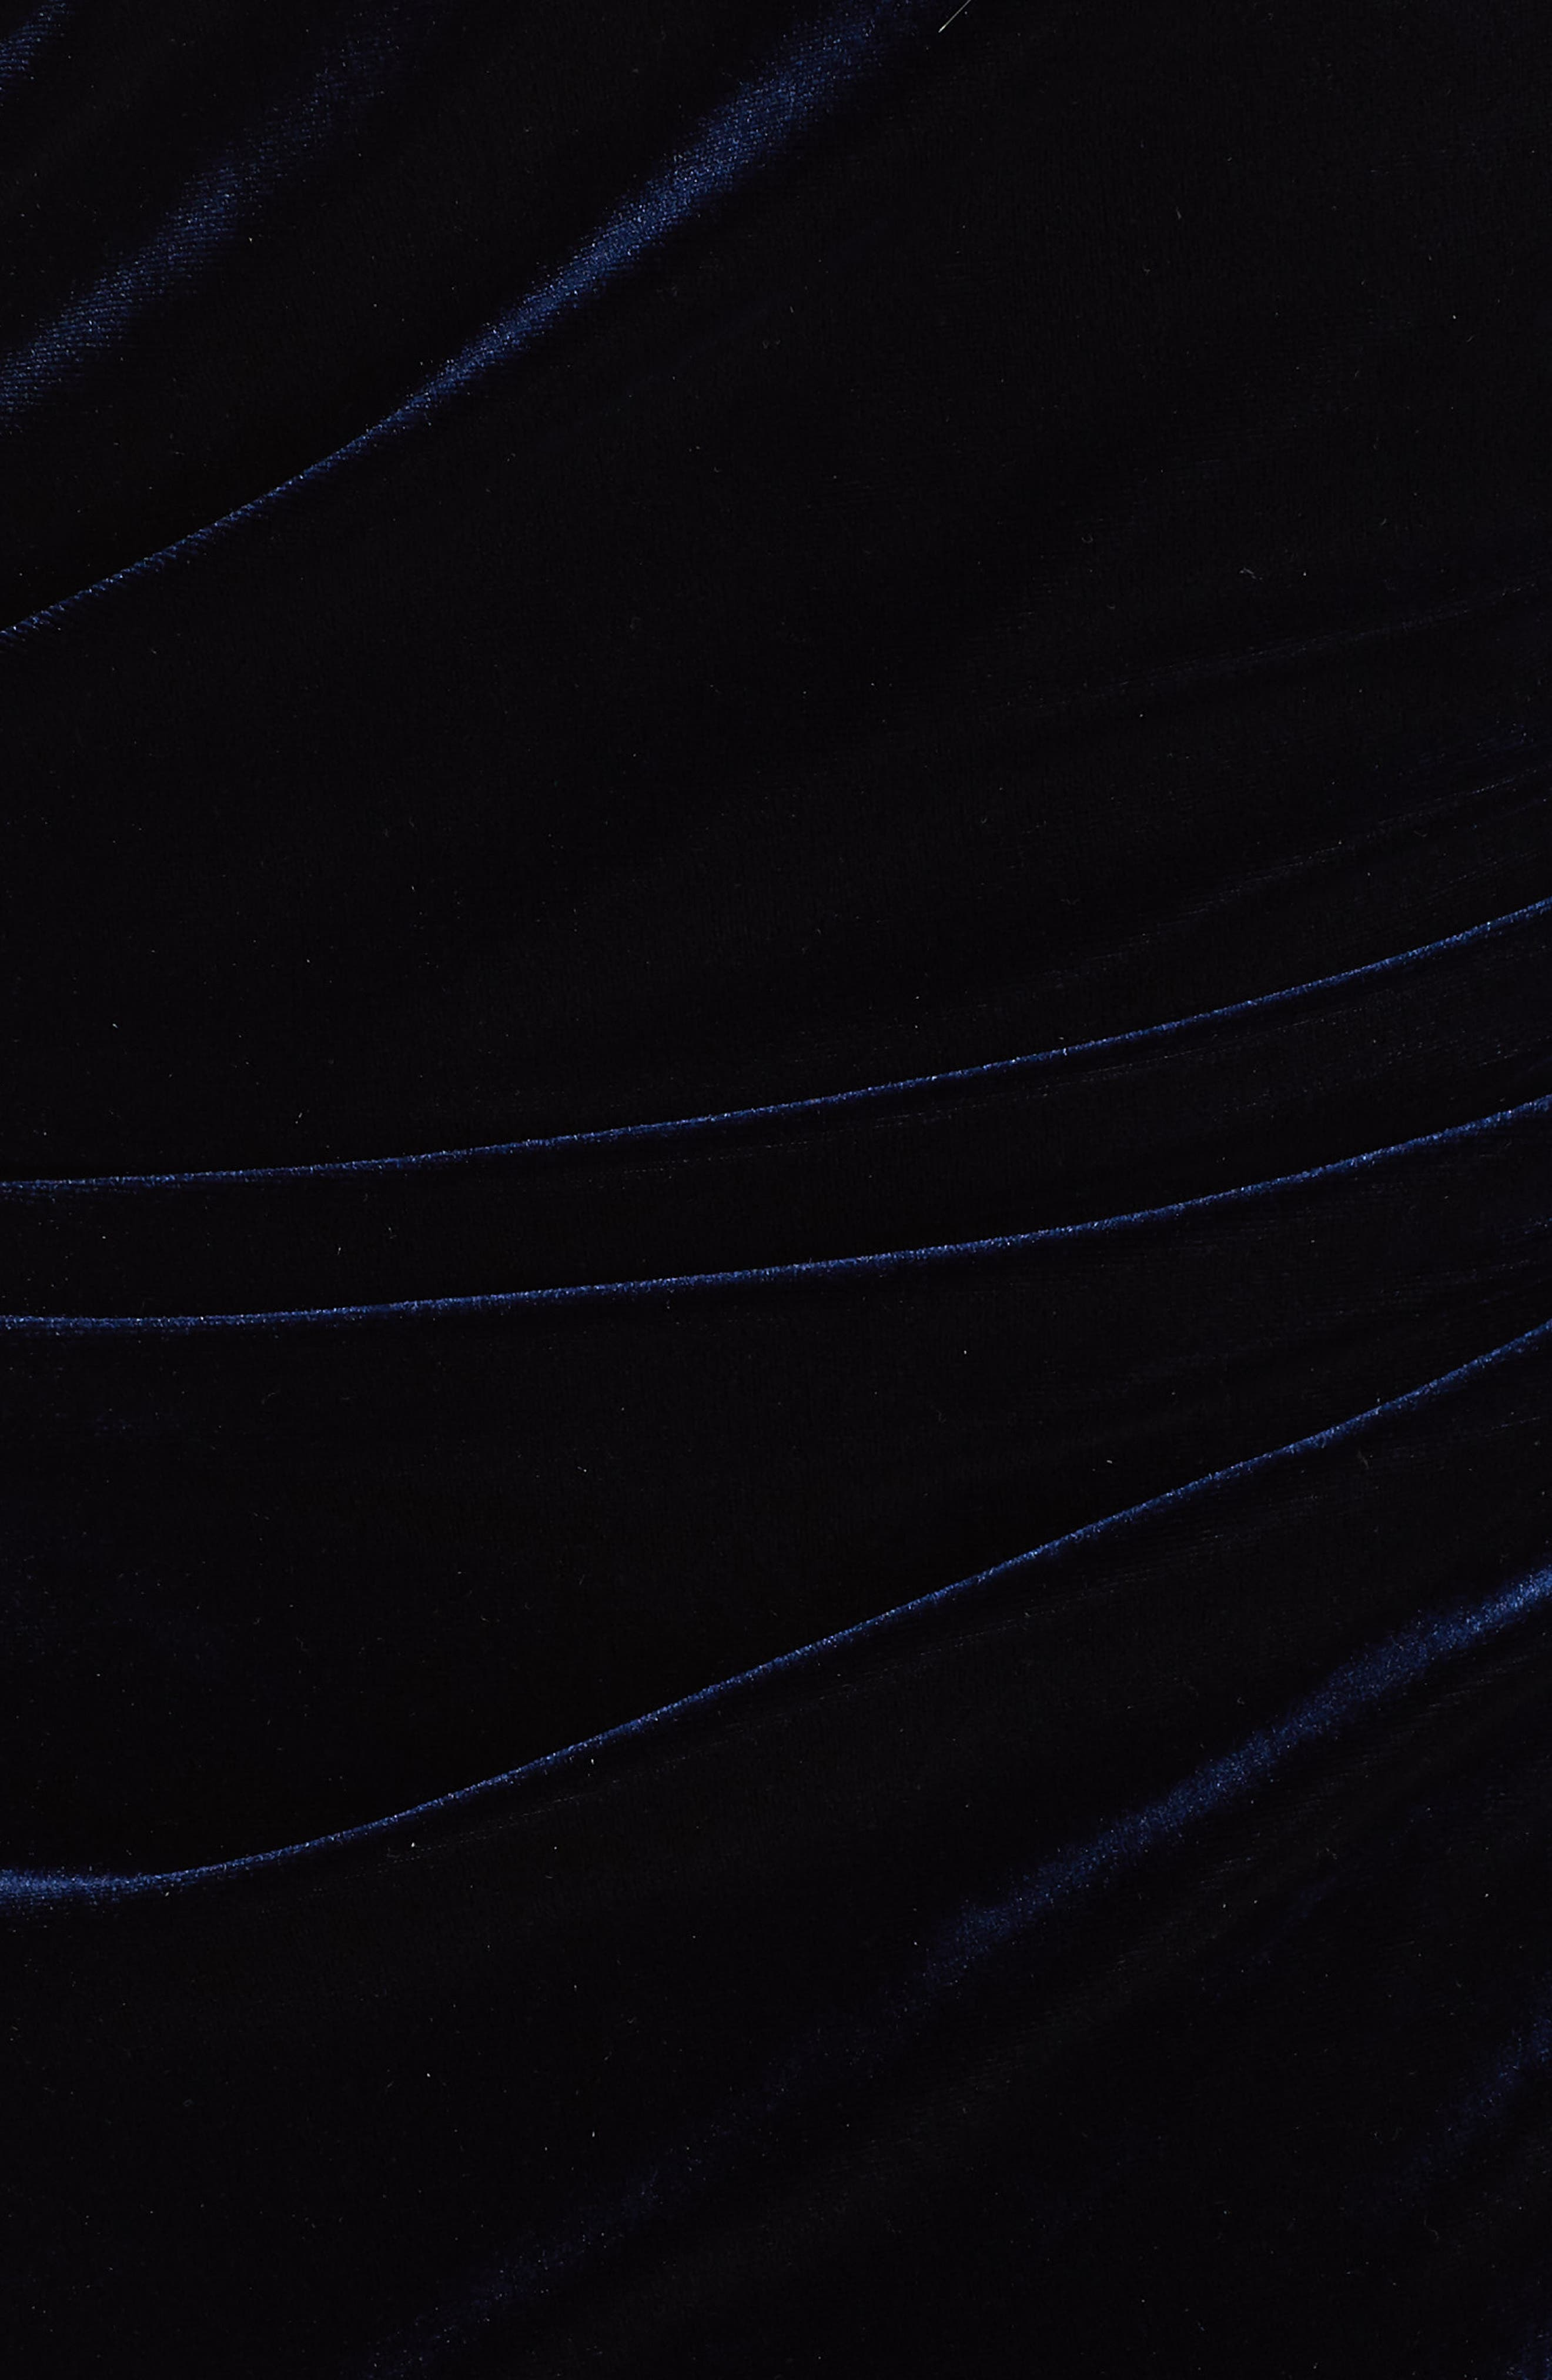 Erenira Mixed Media Gown,                             Alternate thumbnail 5, color,                             BLUE NOTTE